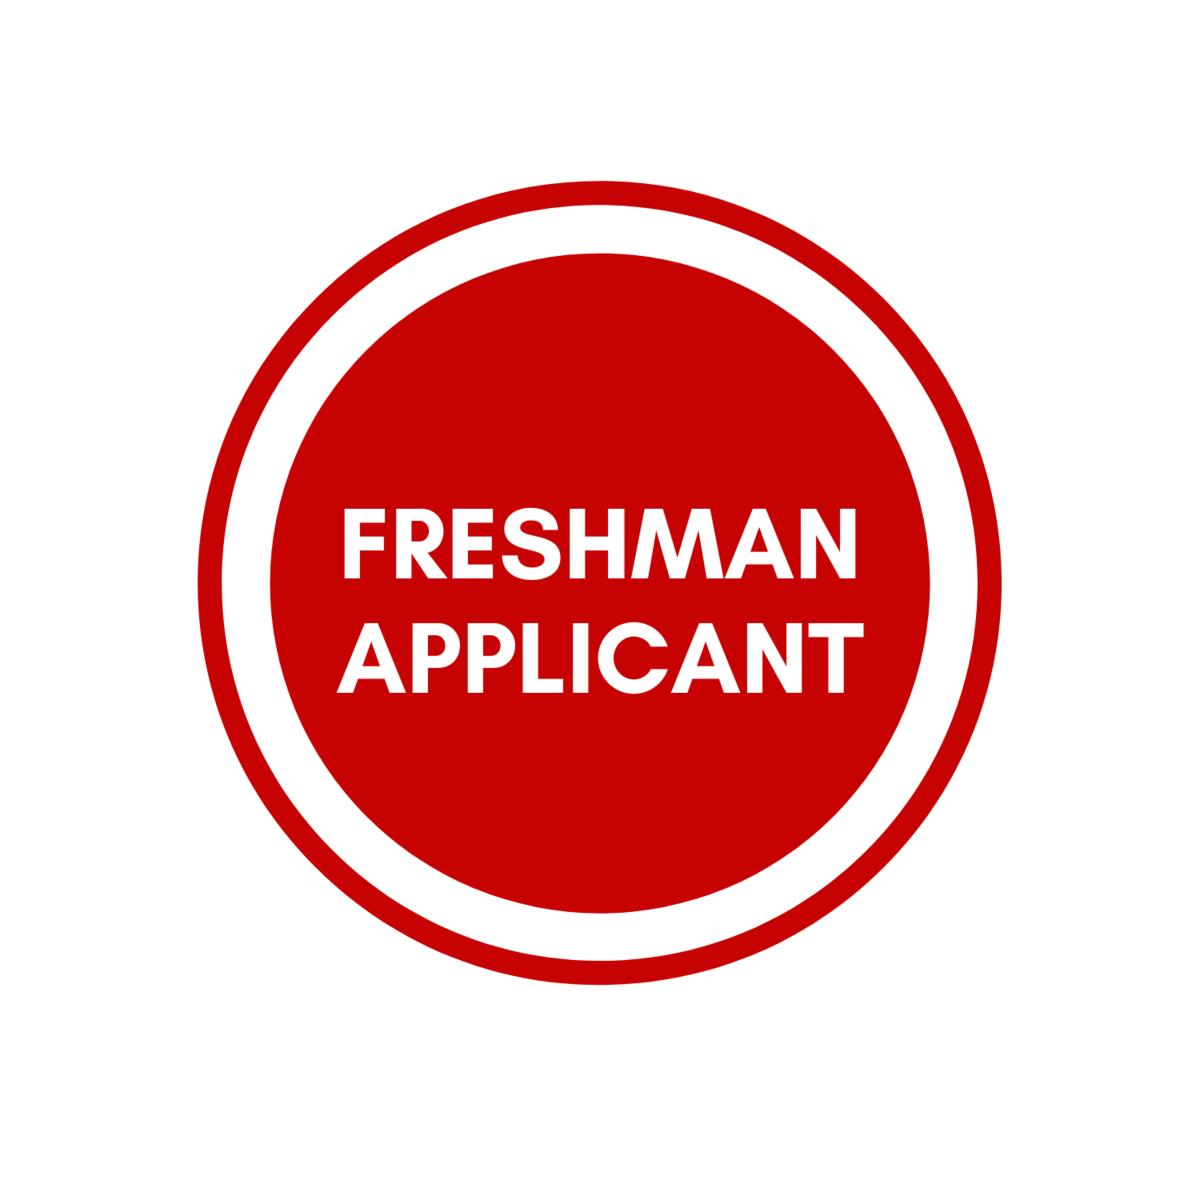 Freshman Applicant